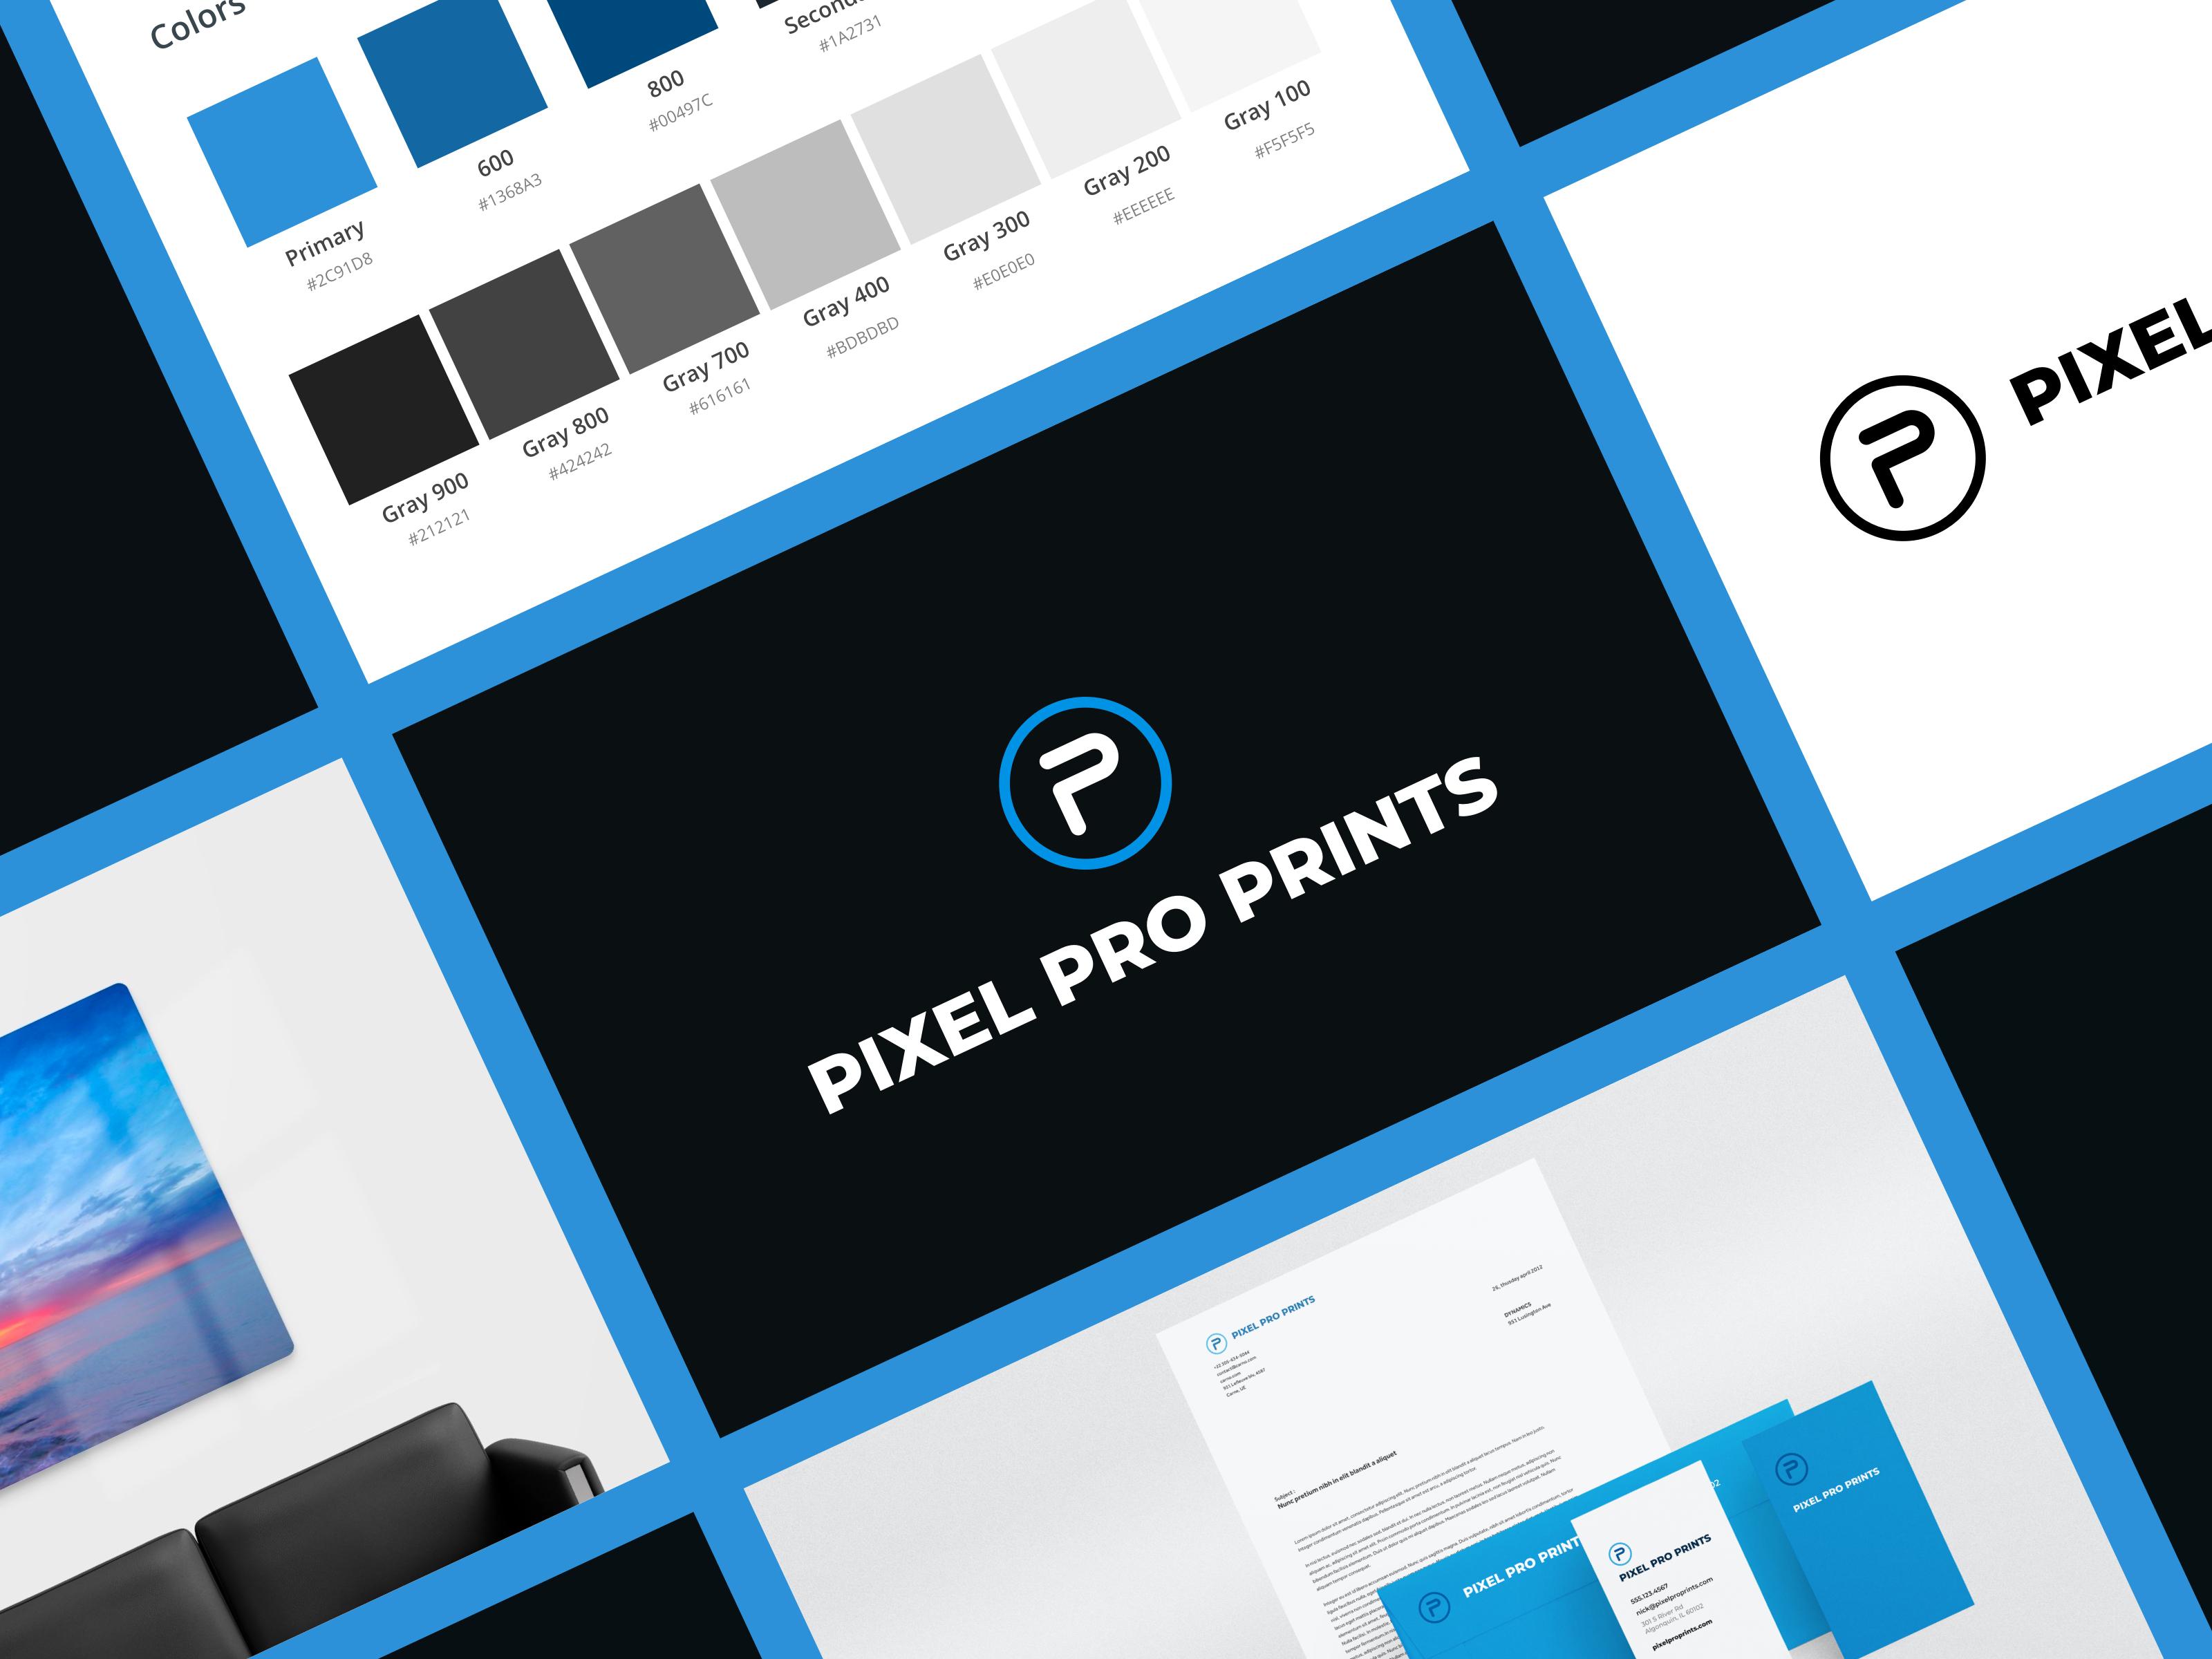 Pixel Pro Prints Branding